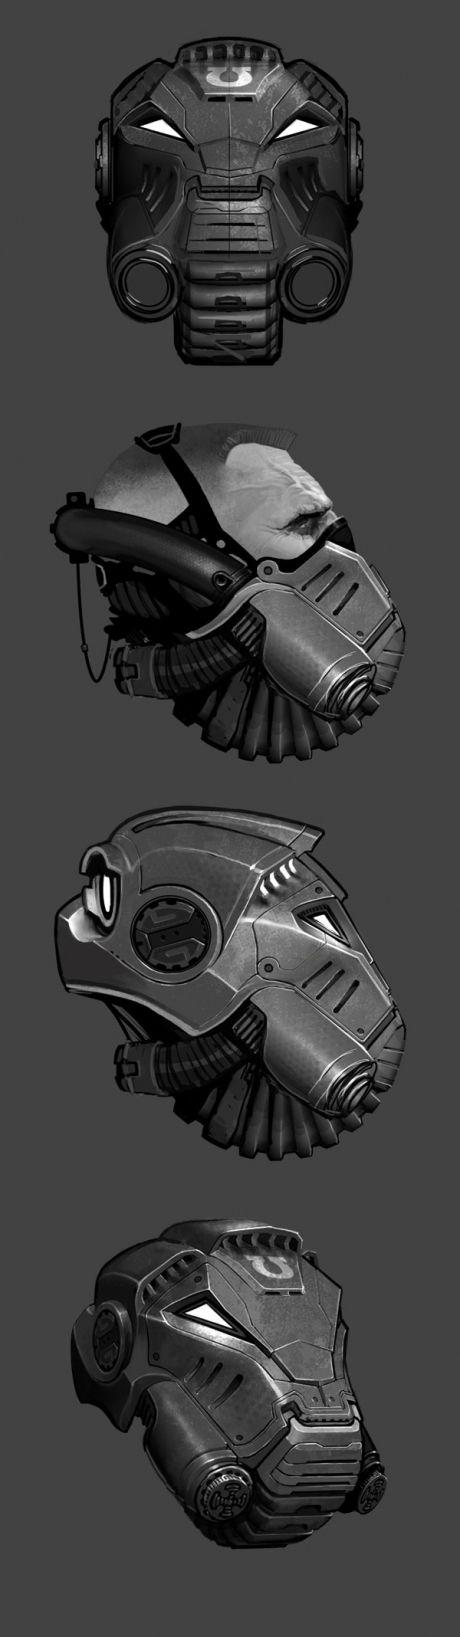 Inspiration   Warhammer 40k Character Design Illustration